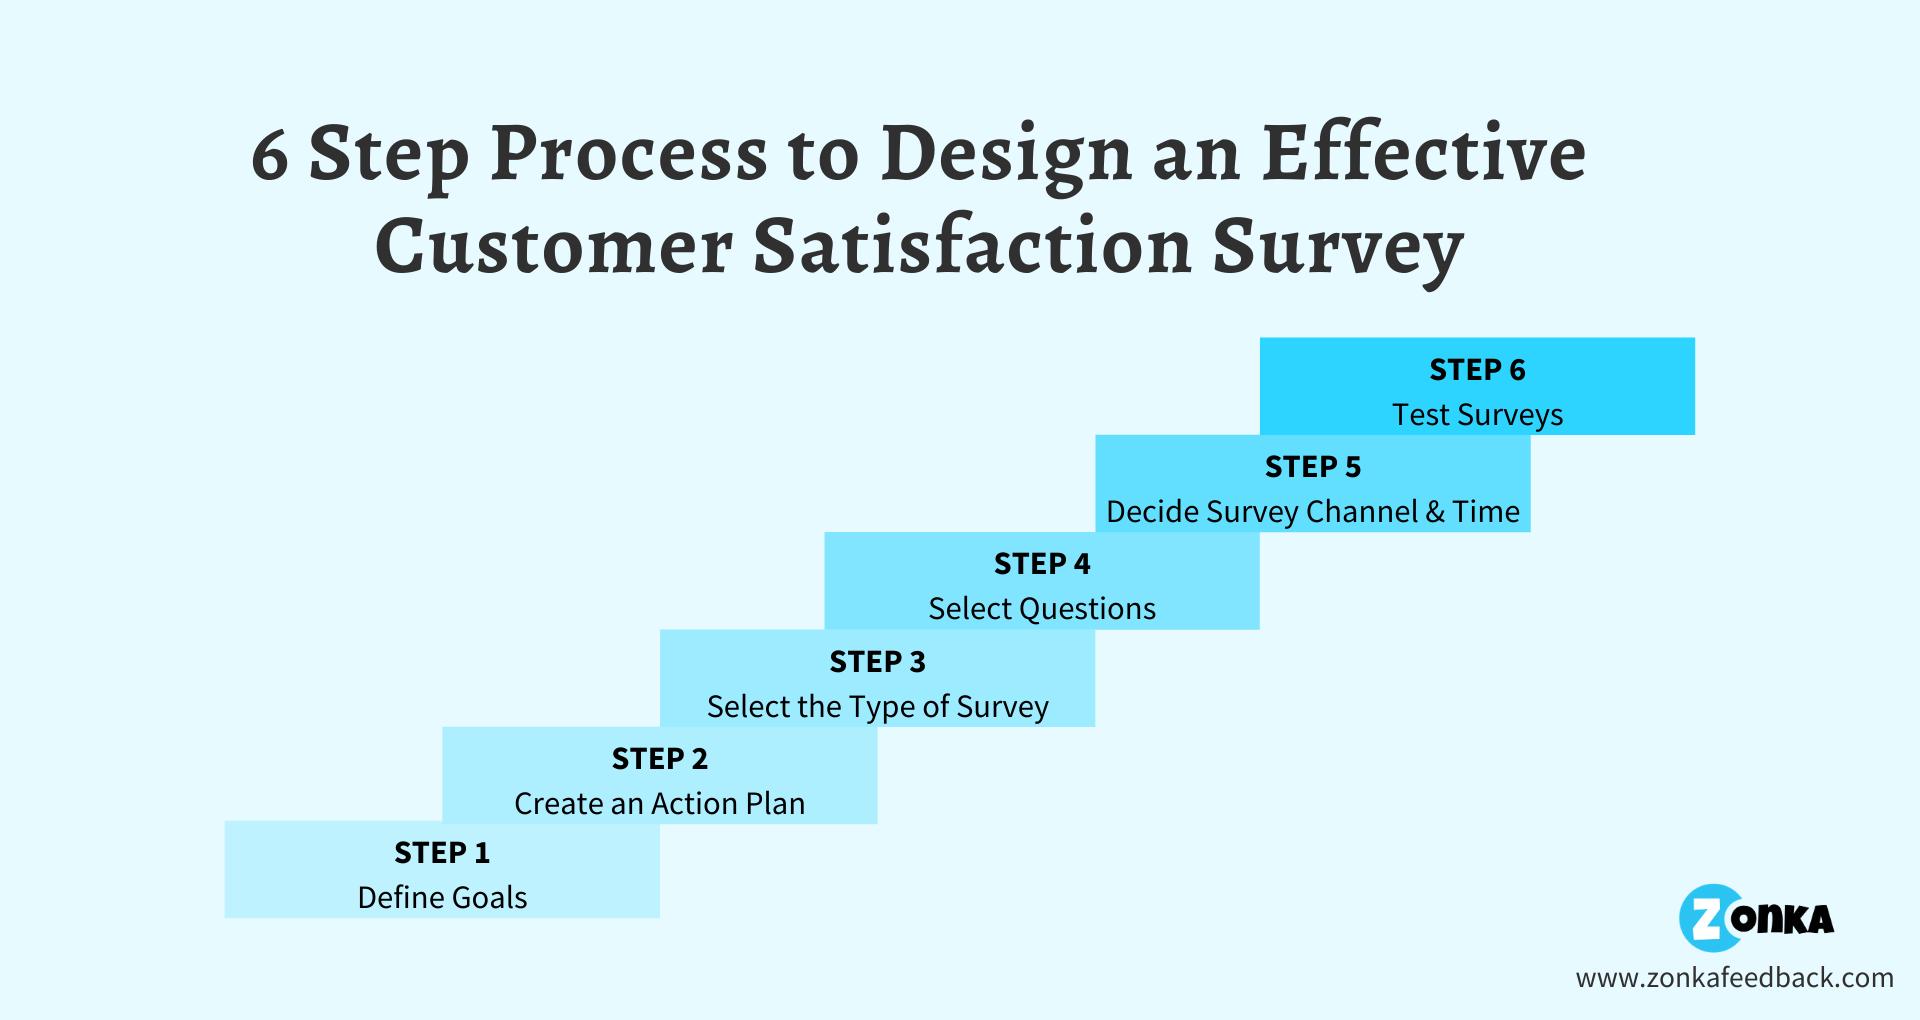 process-to-design-an-effective-customer-satisfaction-survey